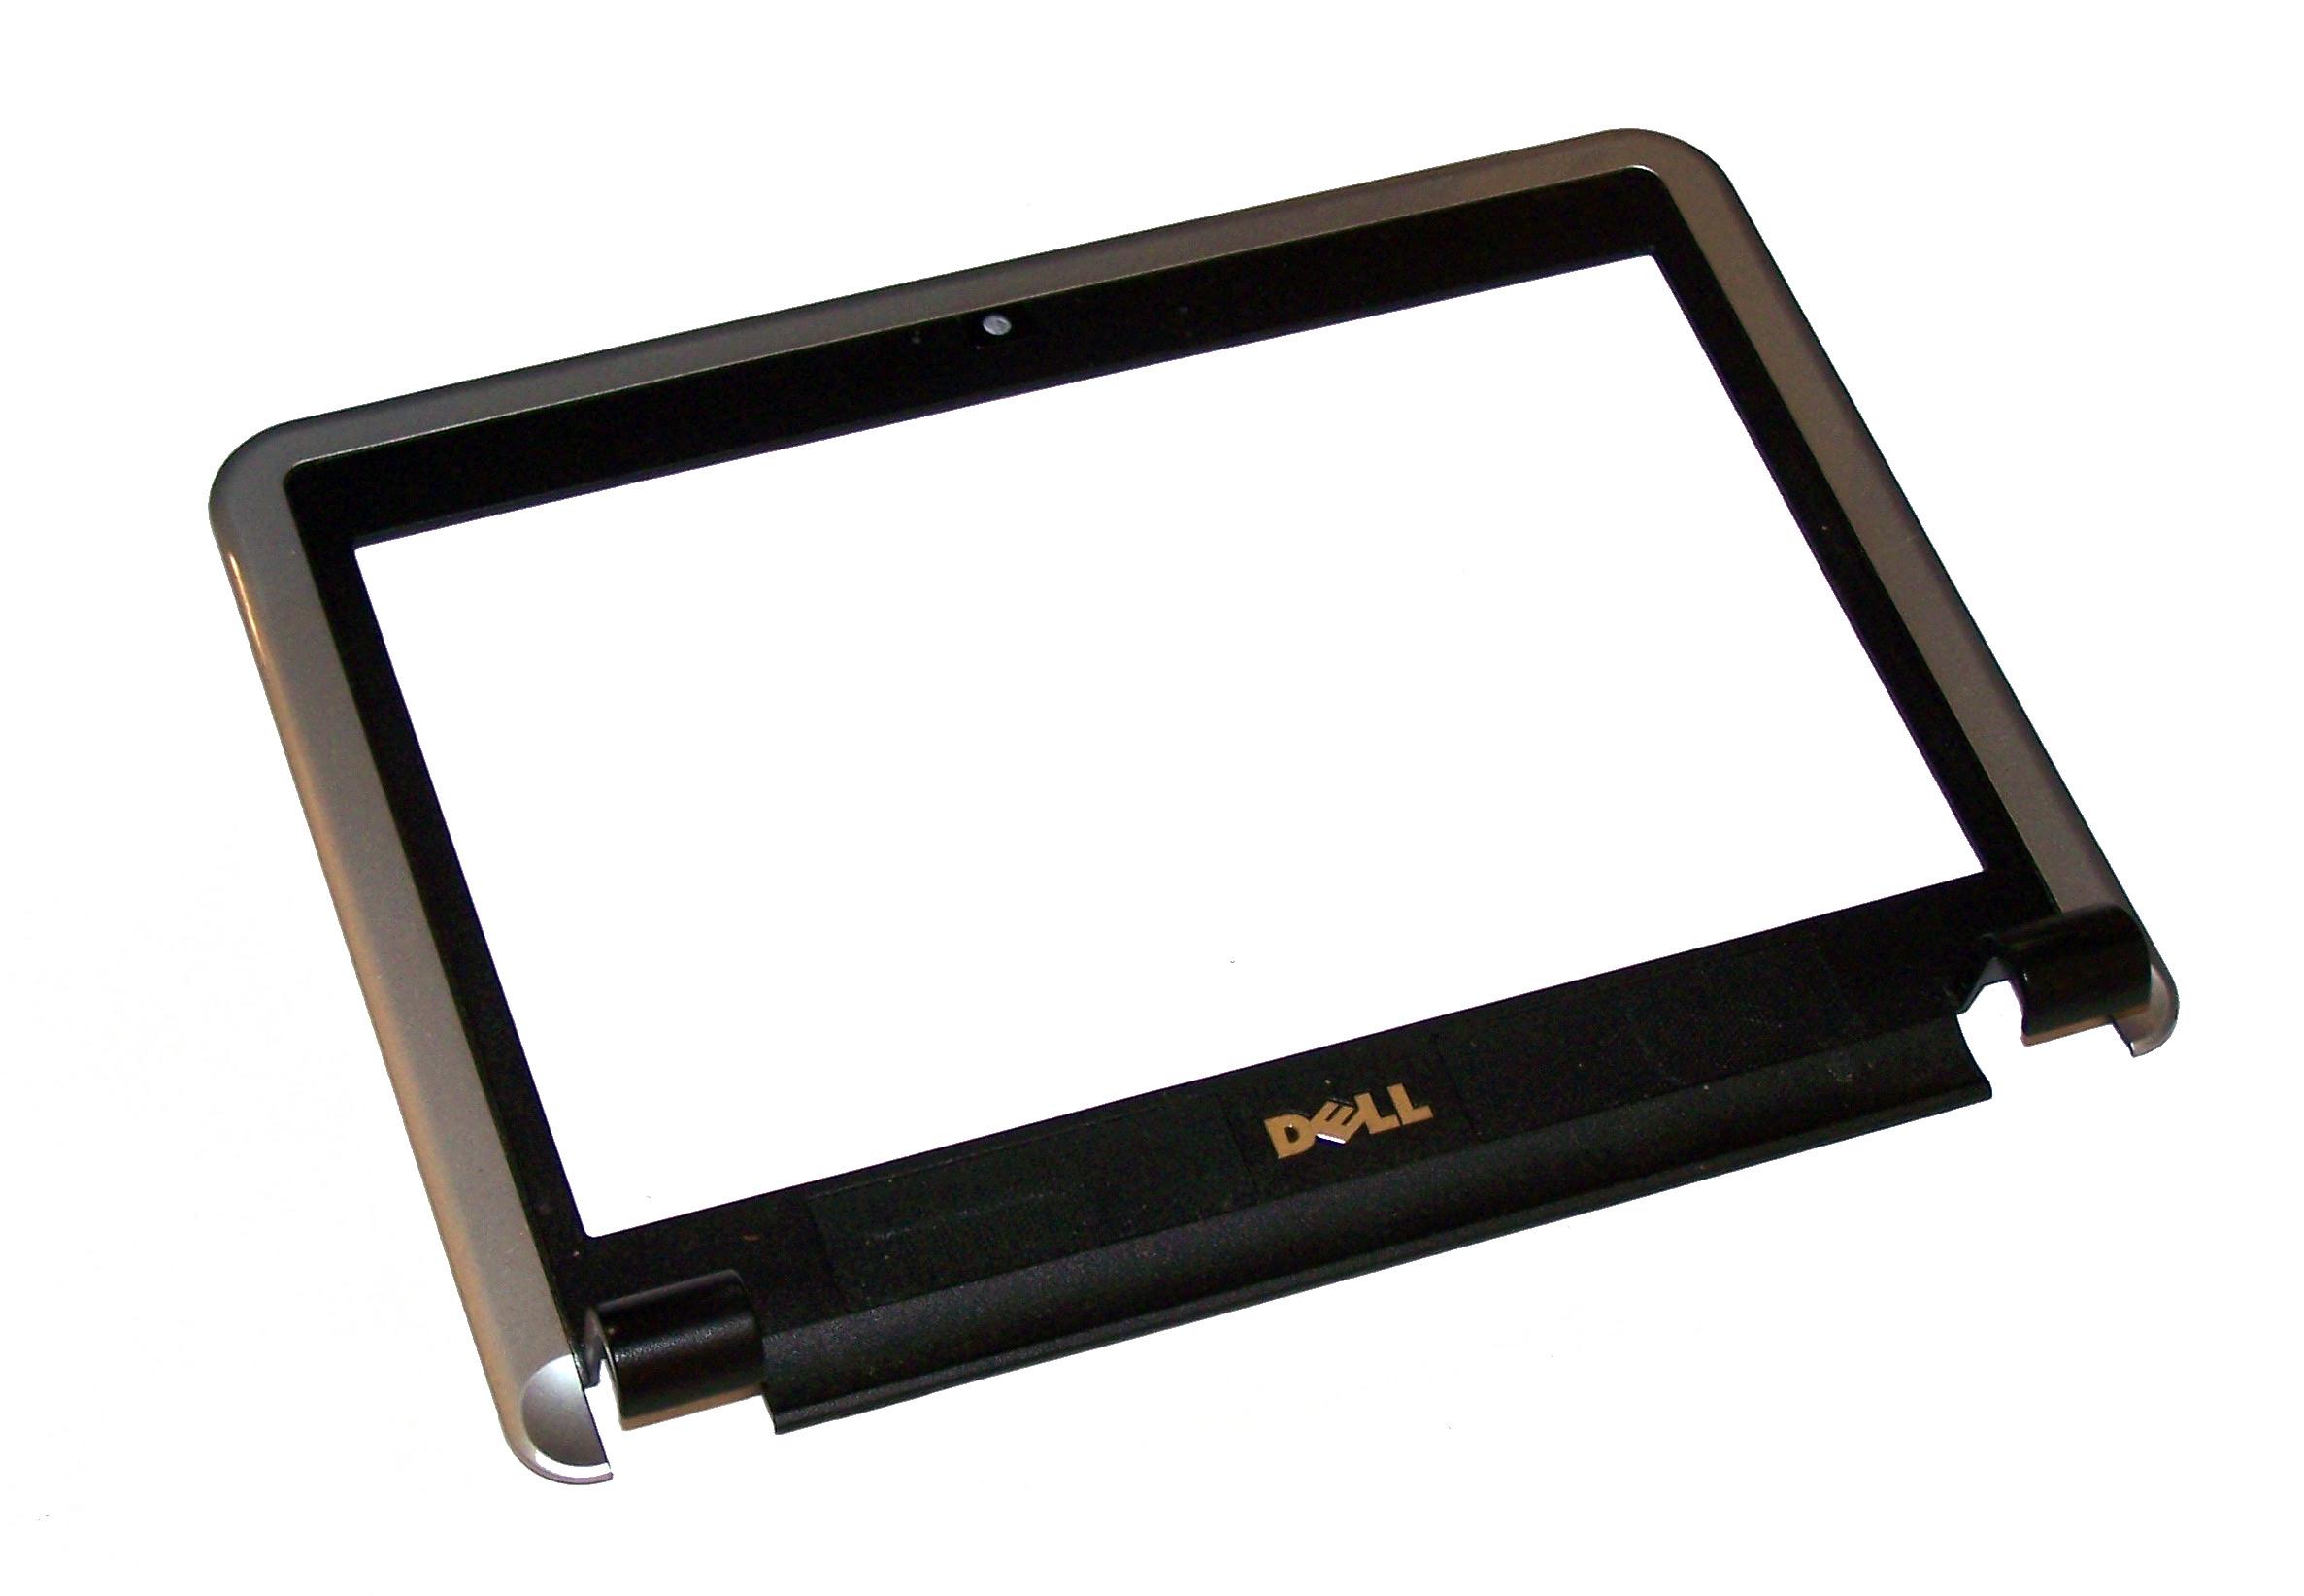 Dell J836H Inspiron Mini 910 Silver/Black LCD Trim Bezel | 0J836H AP054000200